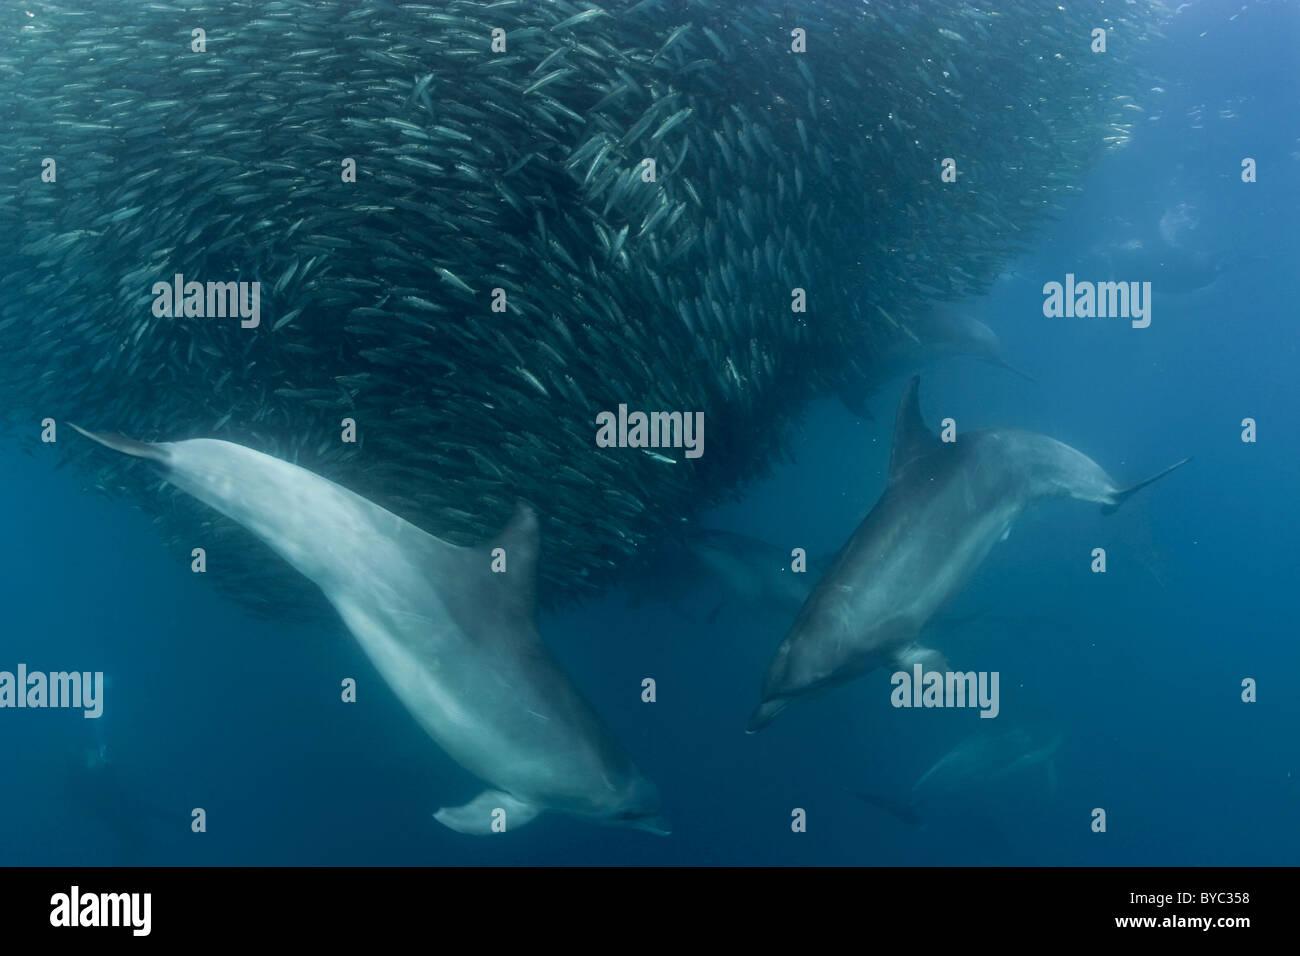 bottlenose dolphins, Tursiops truncatus, prey on bait ball of sardines during Sardine Run, South Africa Stock Photo